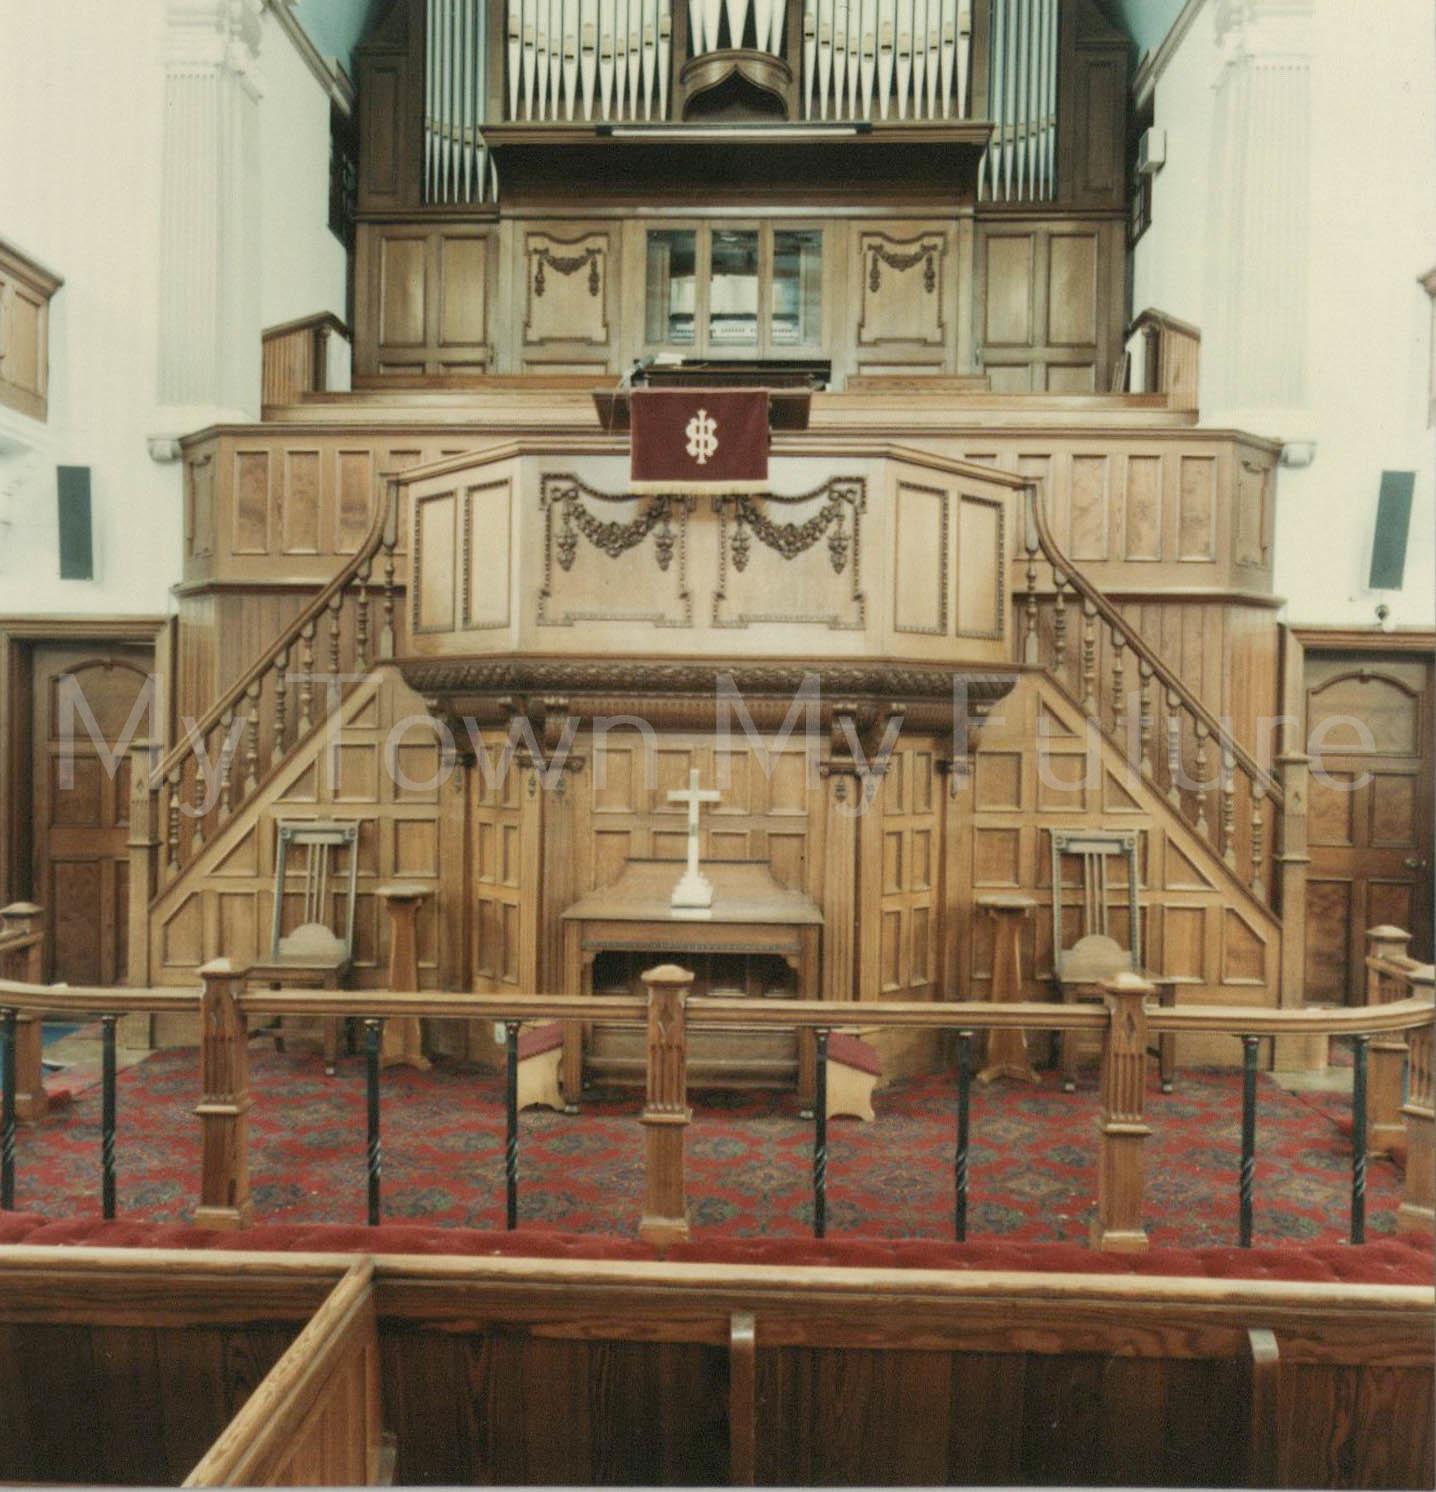 The Avenue Methodist Church